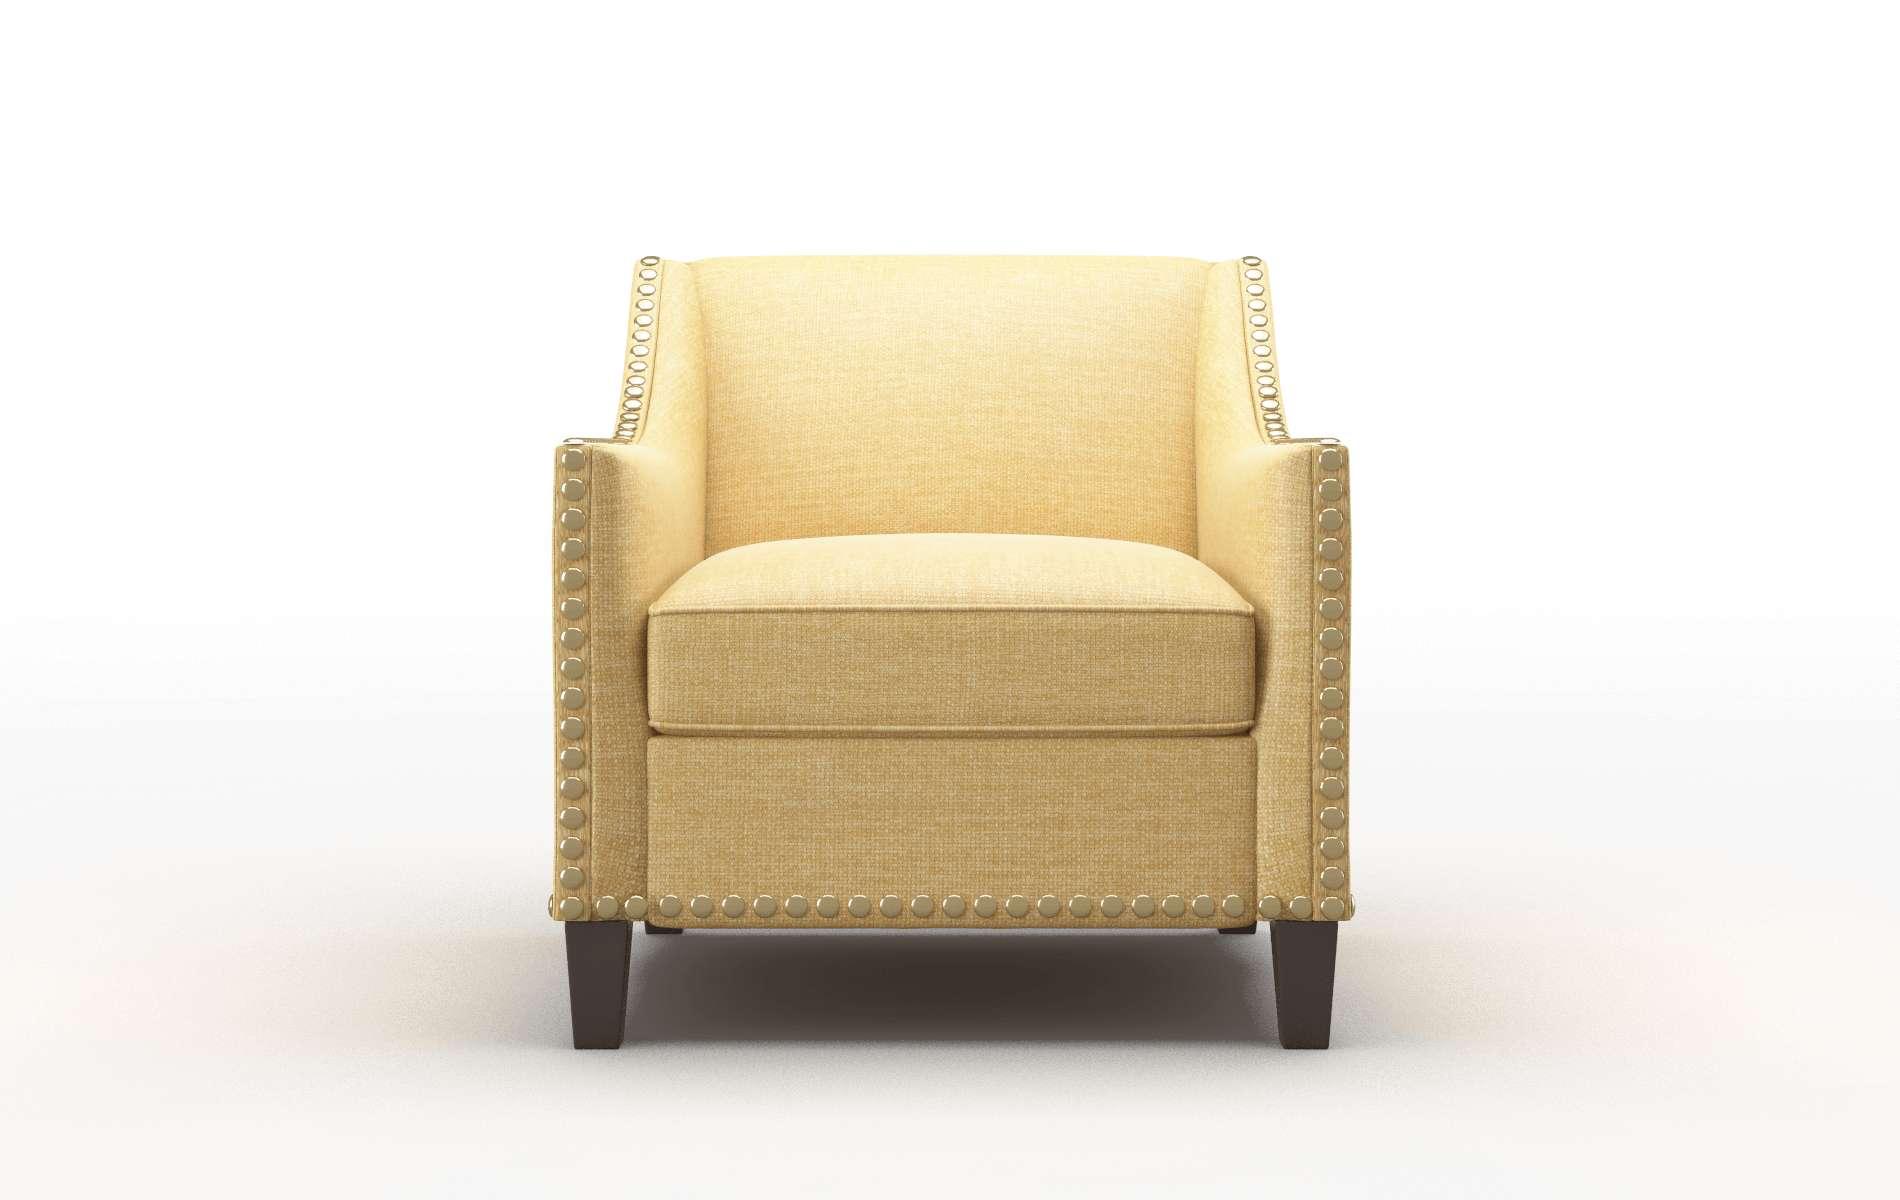 Amsterdam Keylargo Honey Chair espresso legs 1